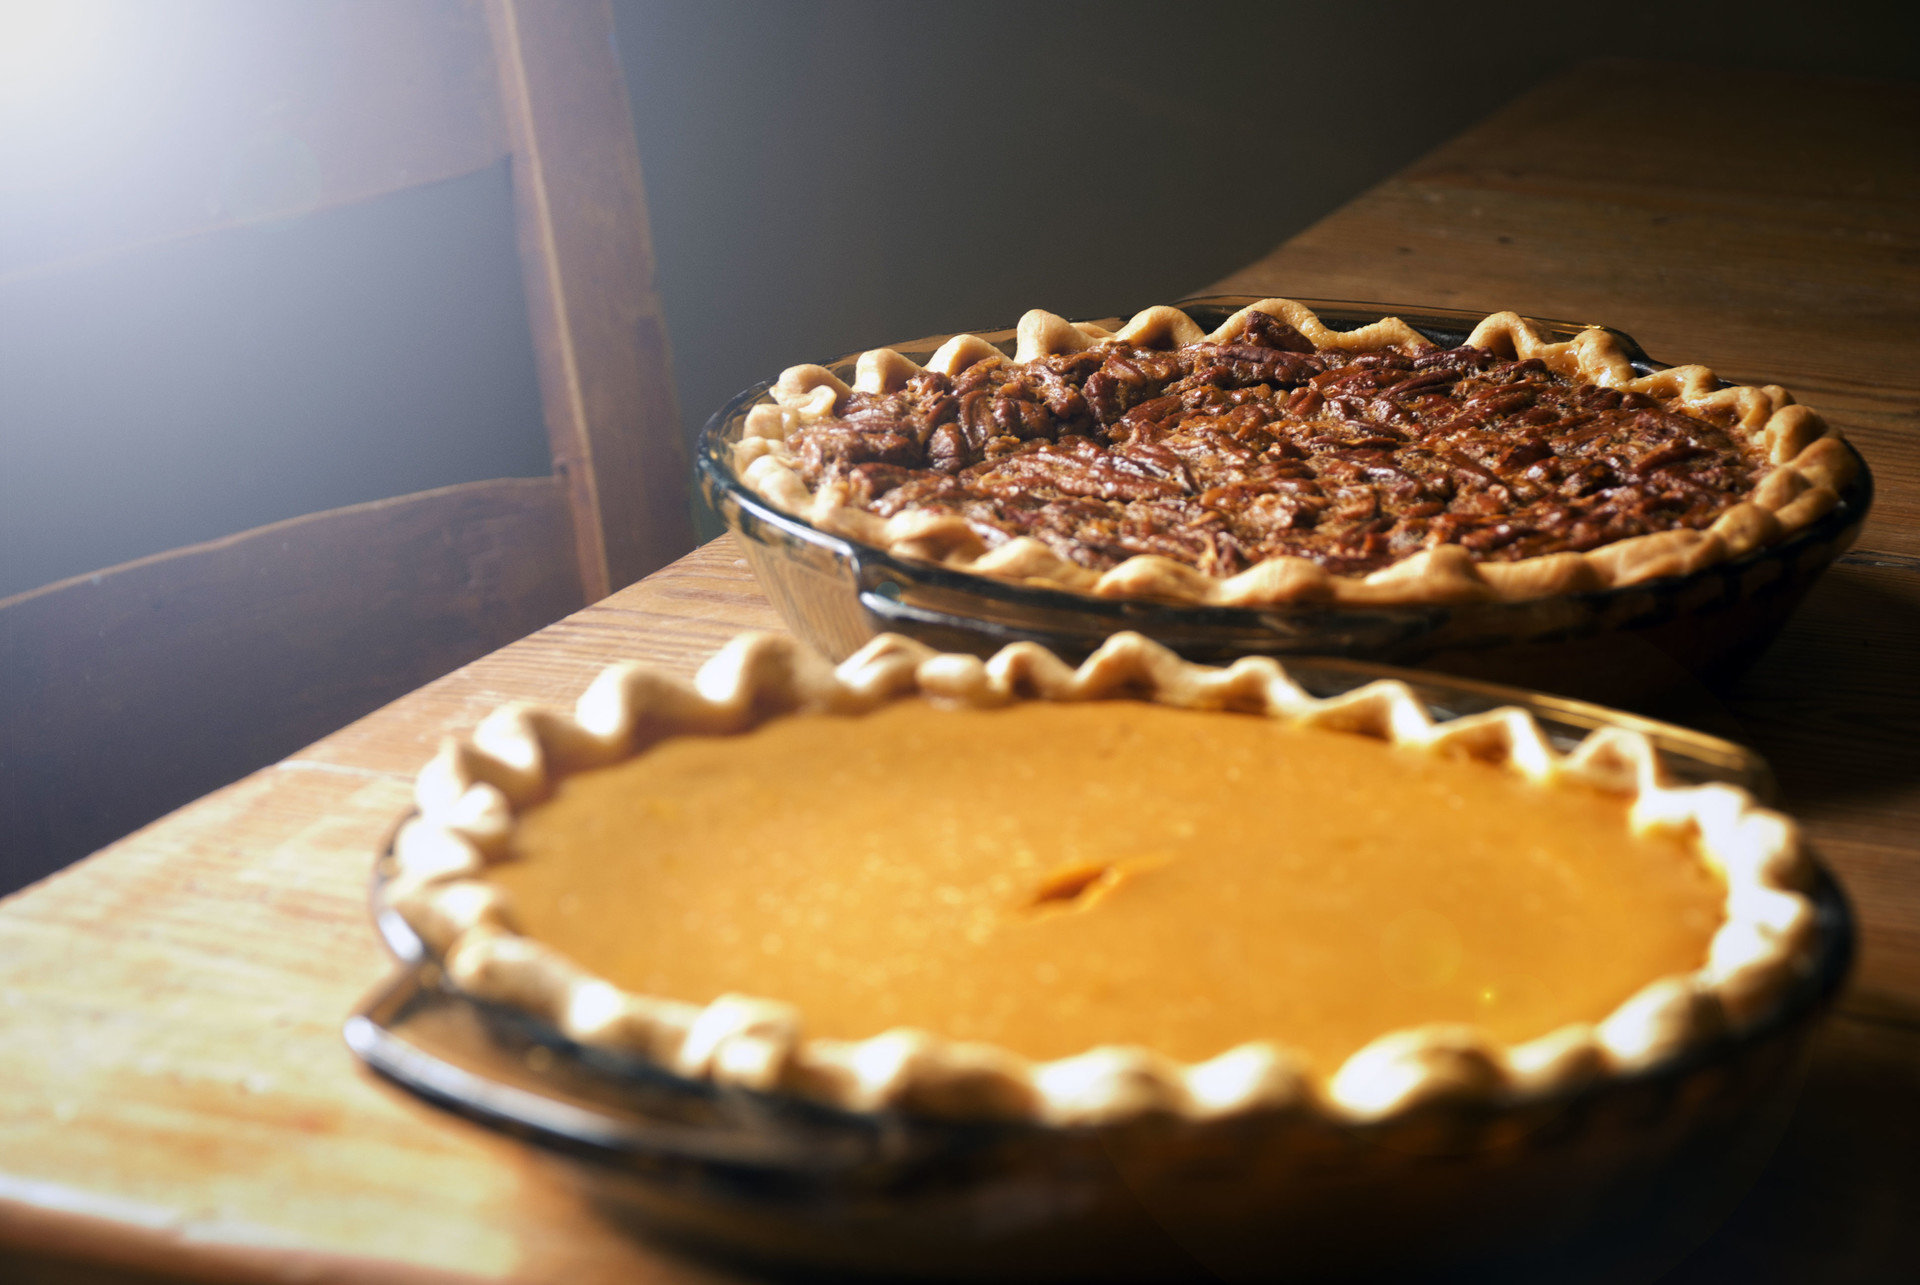 Trip Ideas table food dish cup indoor dessert baked goods pie pumpkin pie produce baking breakfast